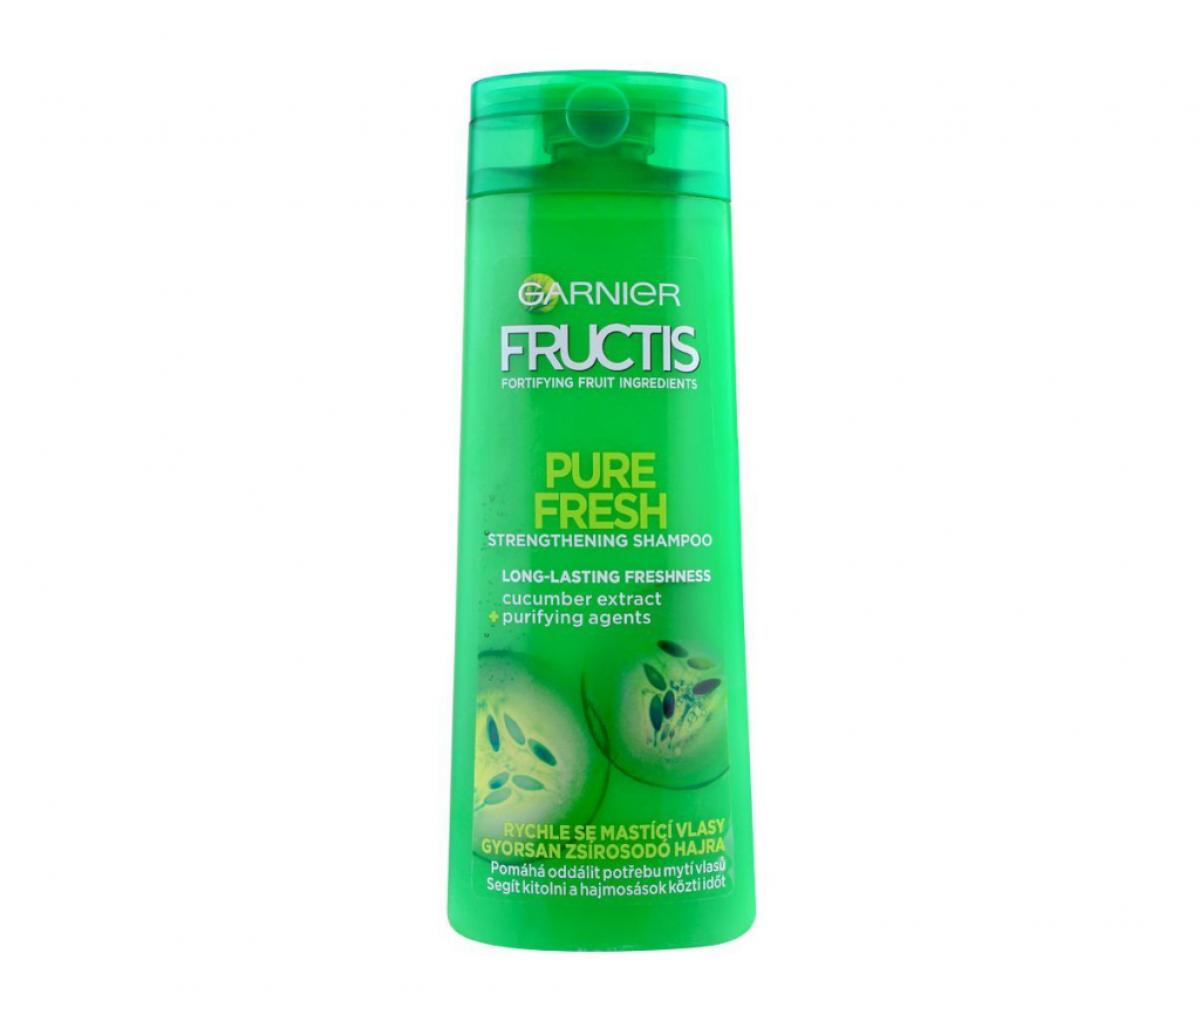 Garnier 400ml Fructis Fresh Shampoo